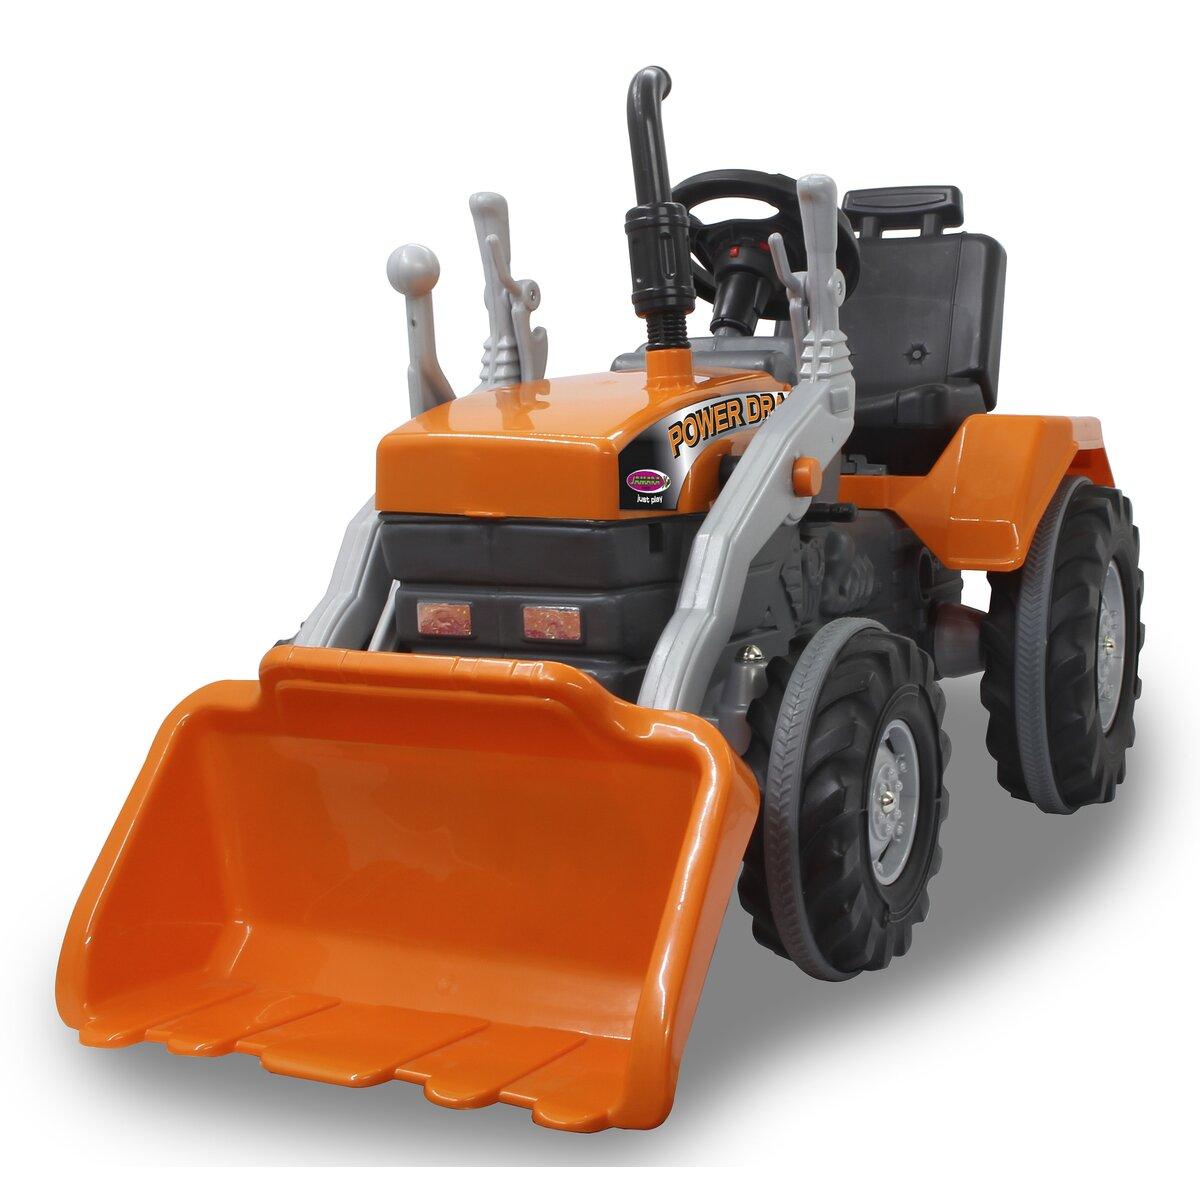 Jamara Šlapací traktor Power Drag se lžící oranžový